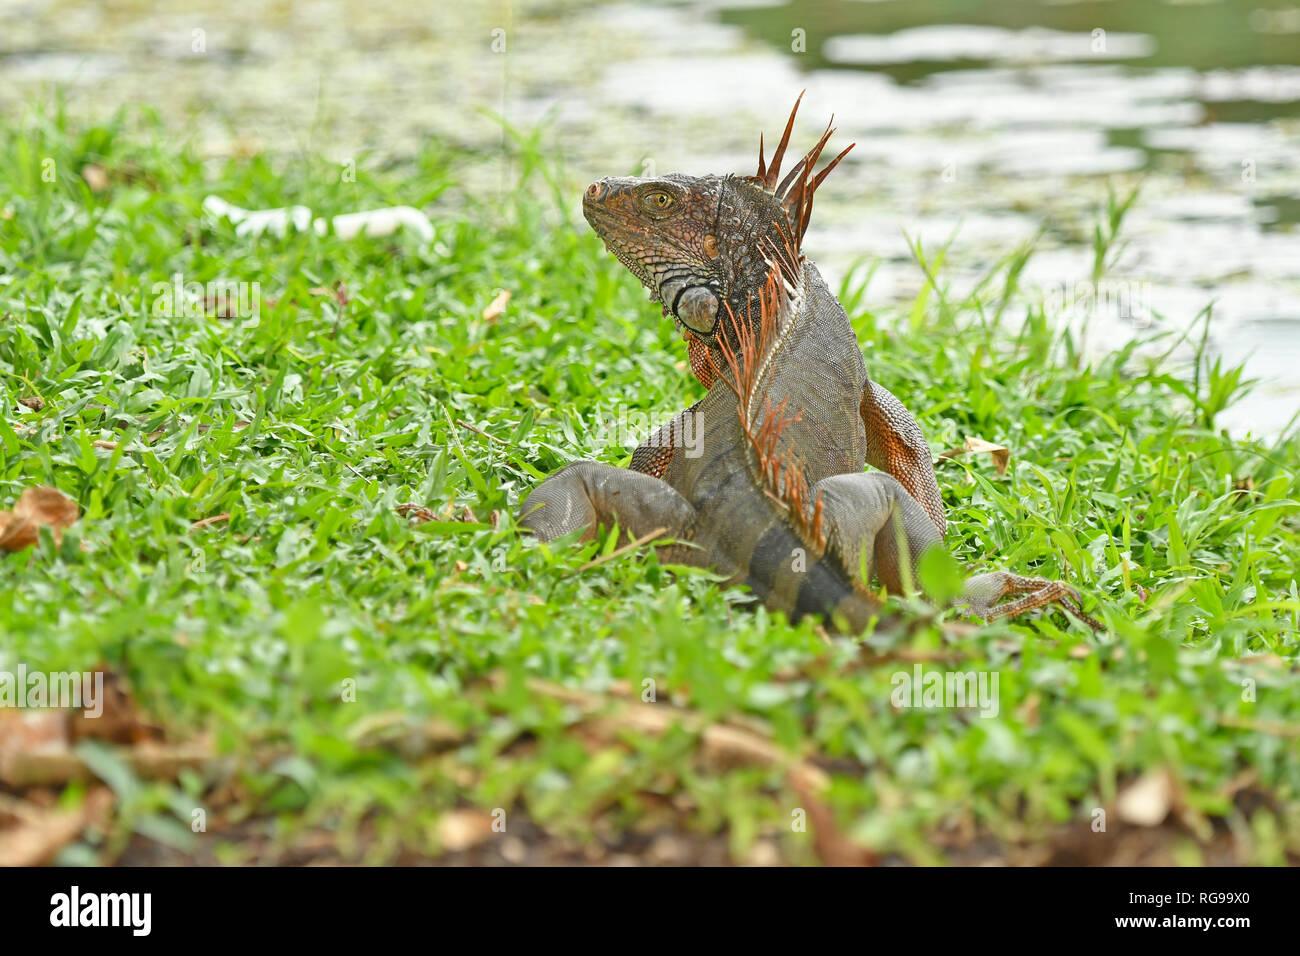 Ou commun Iguane vert (Iguana iguana) adulte assis dans l'herbe, Turrialba, Costa Rica, octobre Banque D'Images